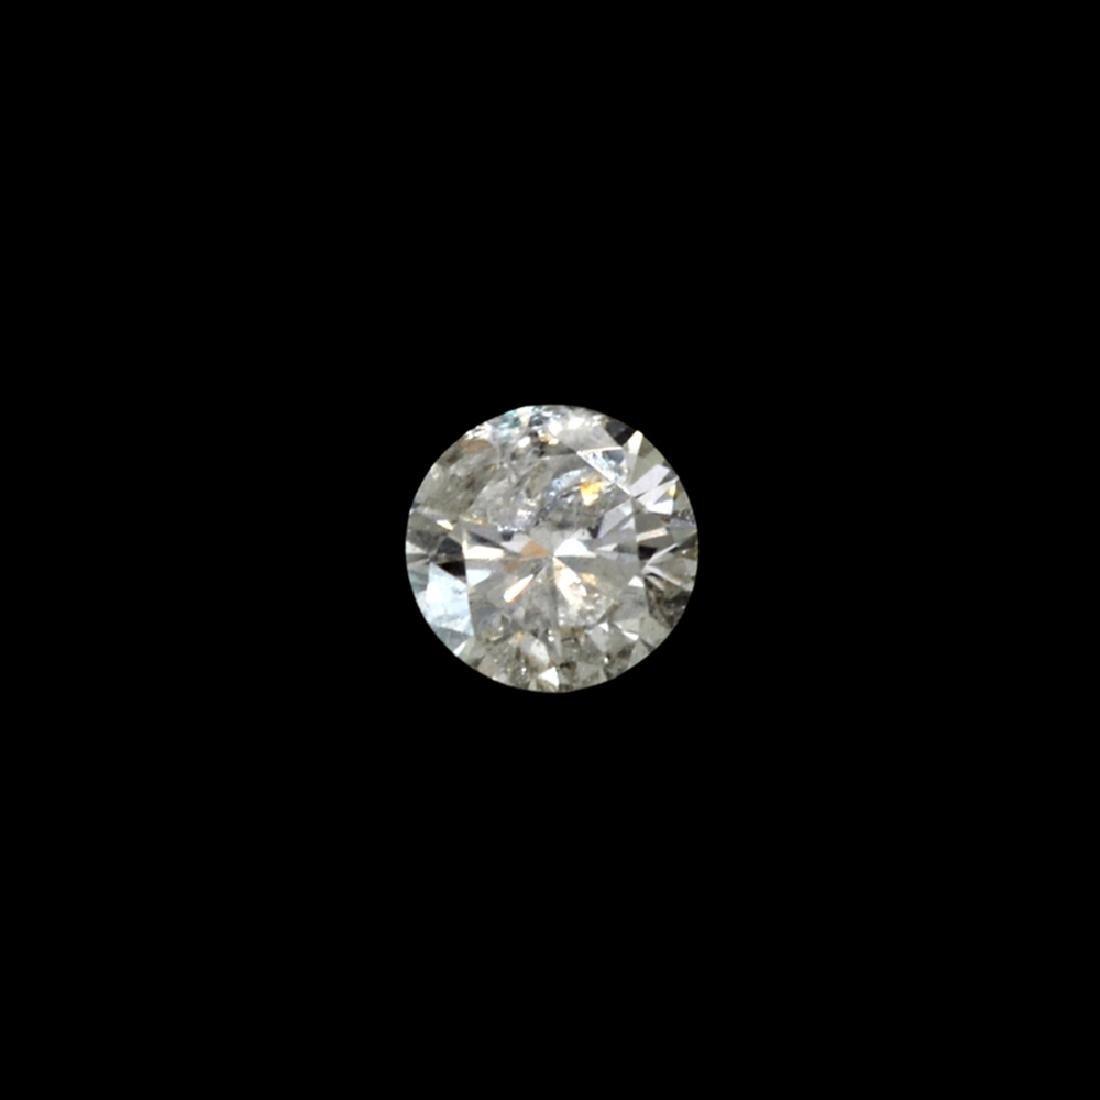 Fine Jewelry GIA Certified 0.19CT Round Brilliant Cut